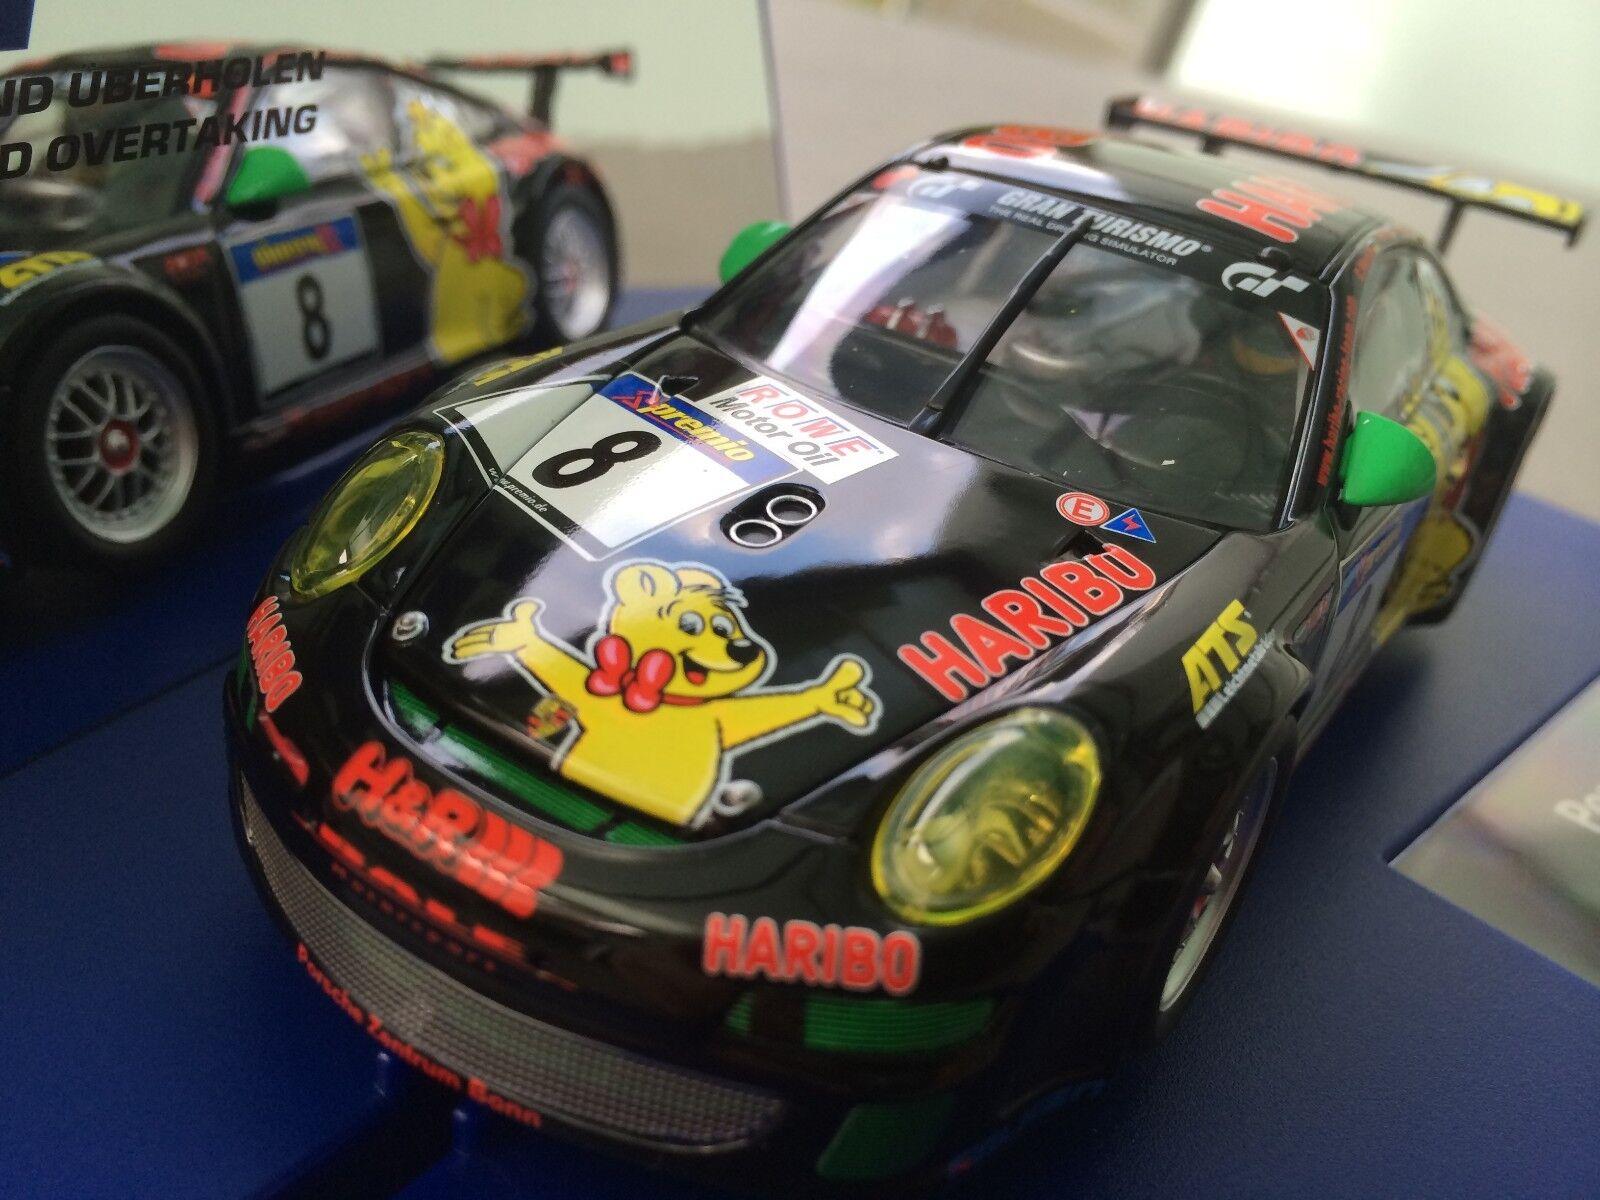 Carrera Digital 132 30680 Porsche GT3 Rsr   Haribo Racing   Nip in Box